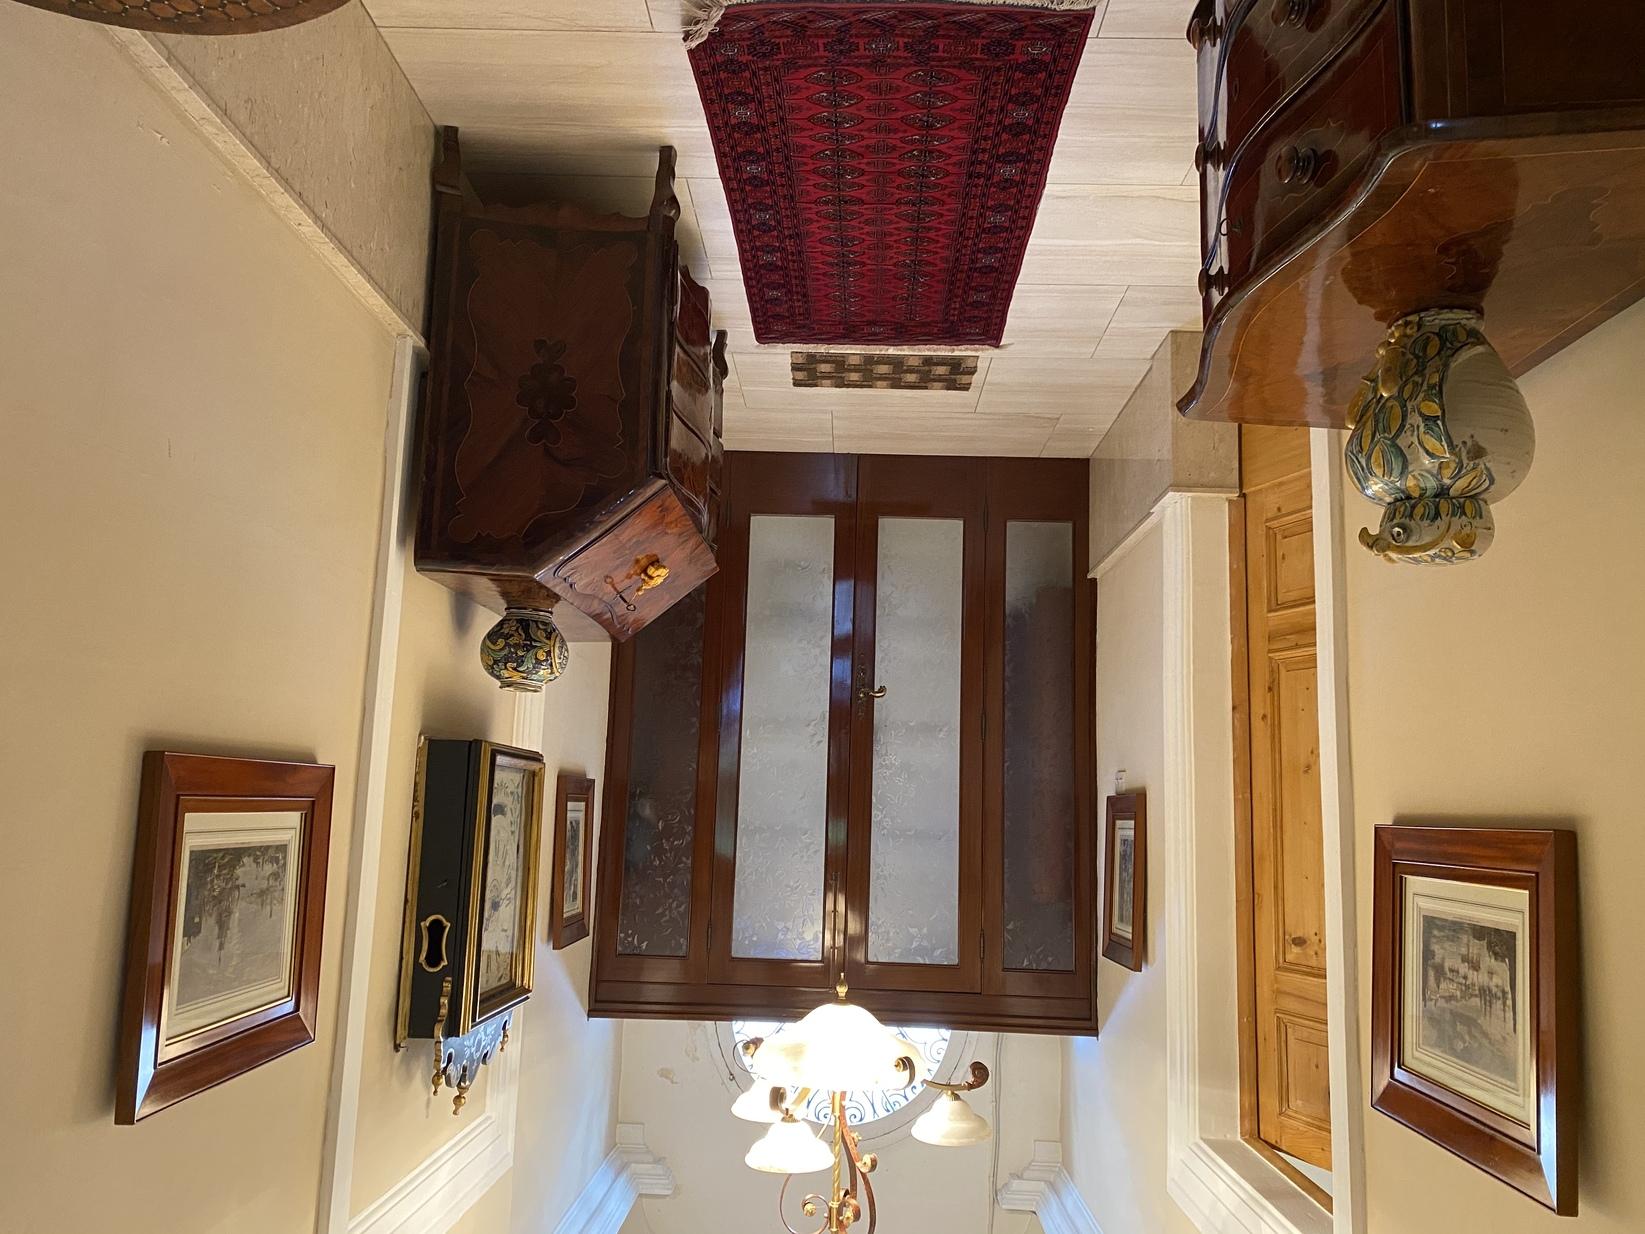 3 bed Terraced House For Sale in Santa Venera, Santa Venera - thumb 8